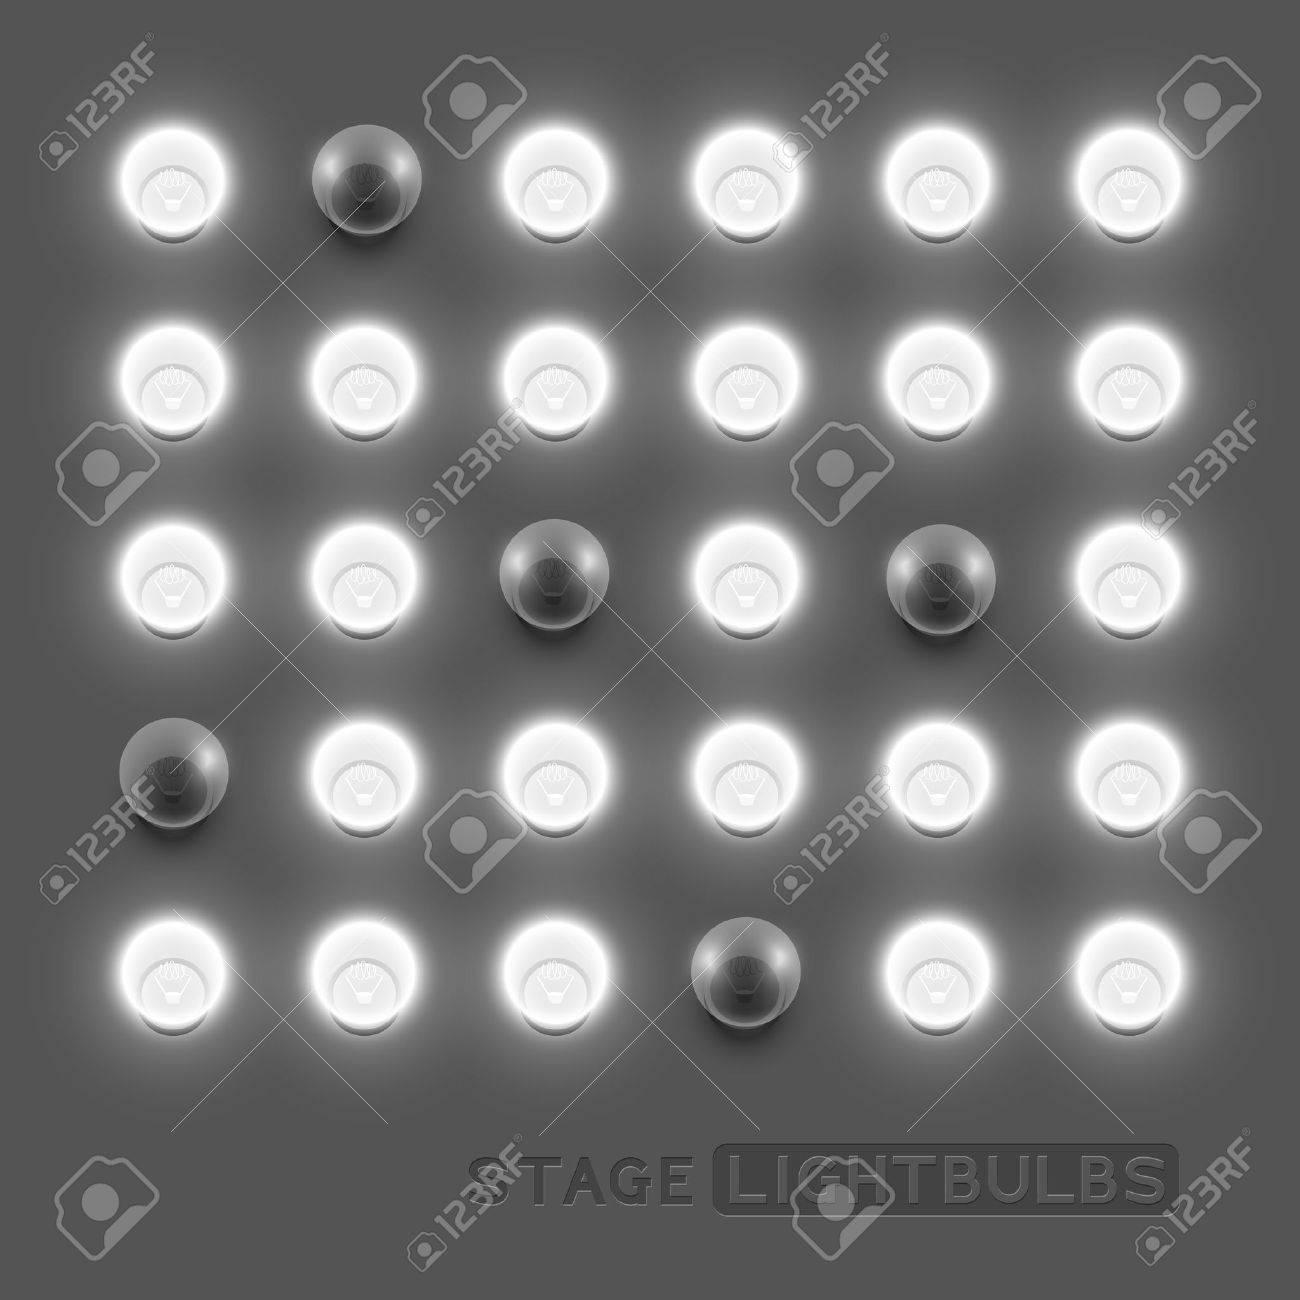 stage light bulbs stock vector